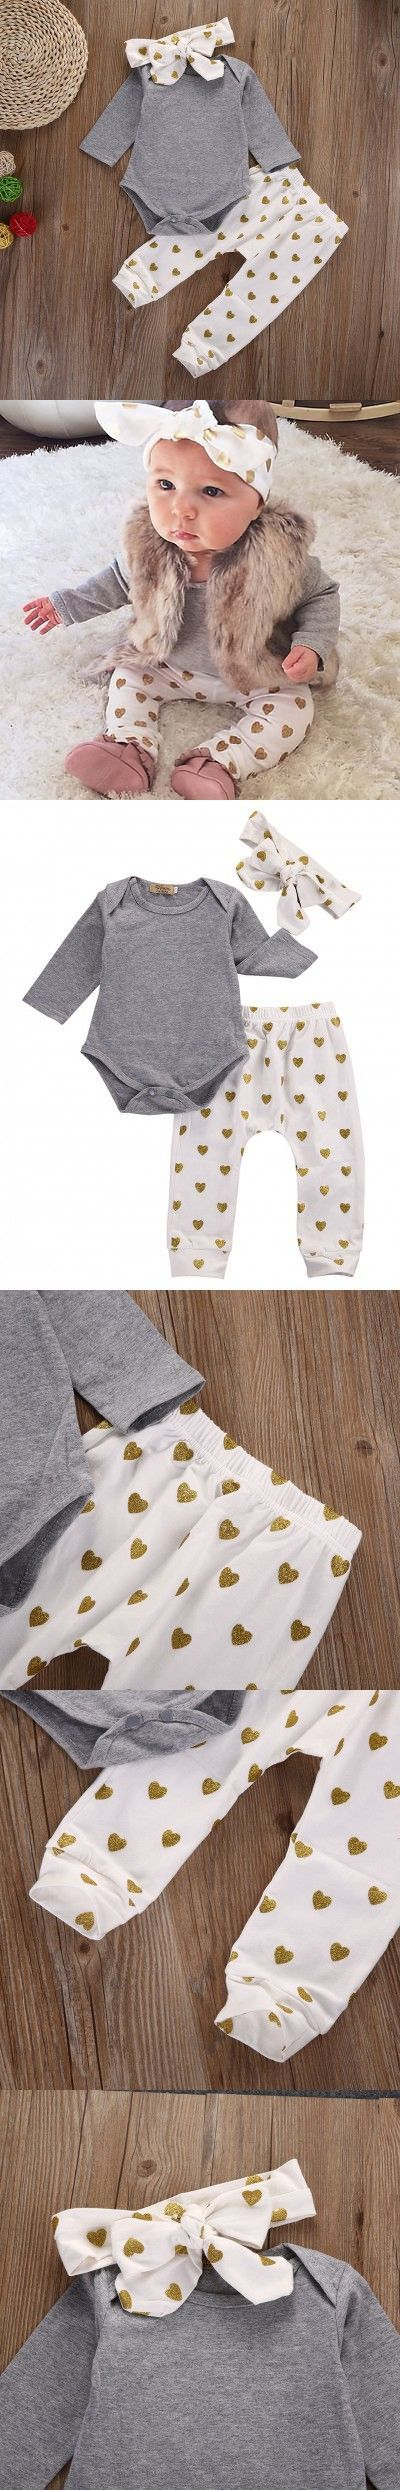 3pcs autumn warm 0-18M NewBorn toddler infant princess DOT Baby Girl Infant Top Shirt+Pant Legging+Headband Outfit Set Clothing $5.39